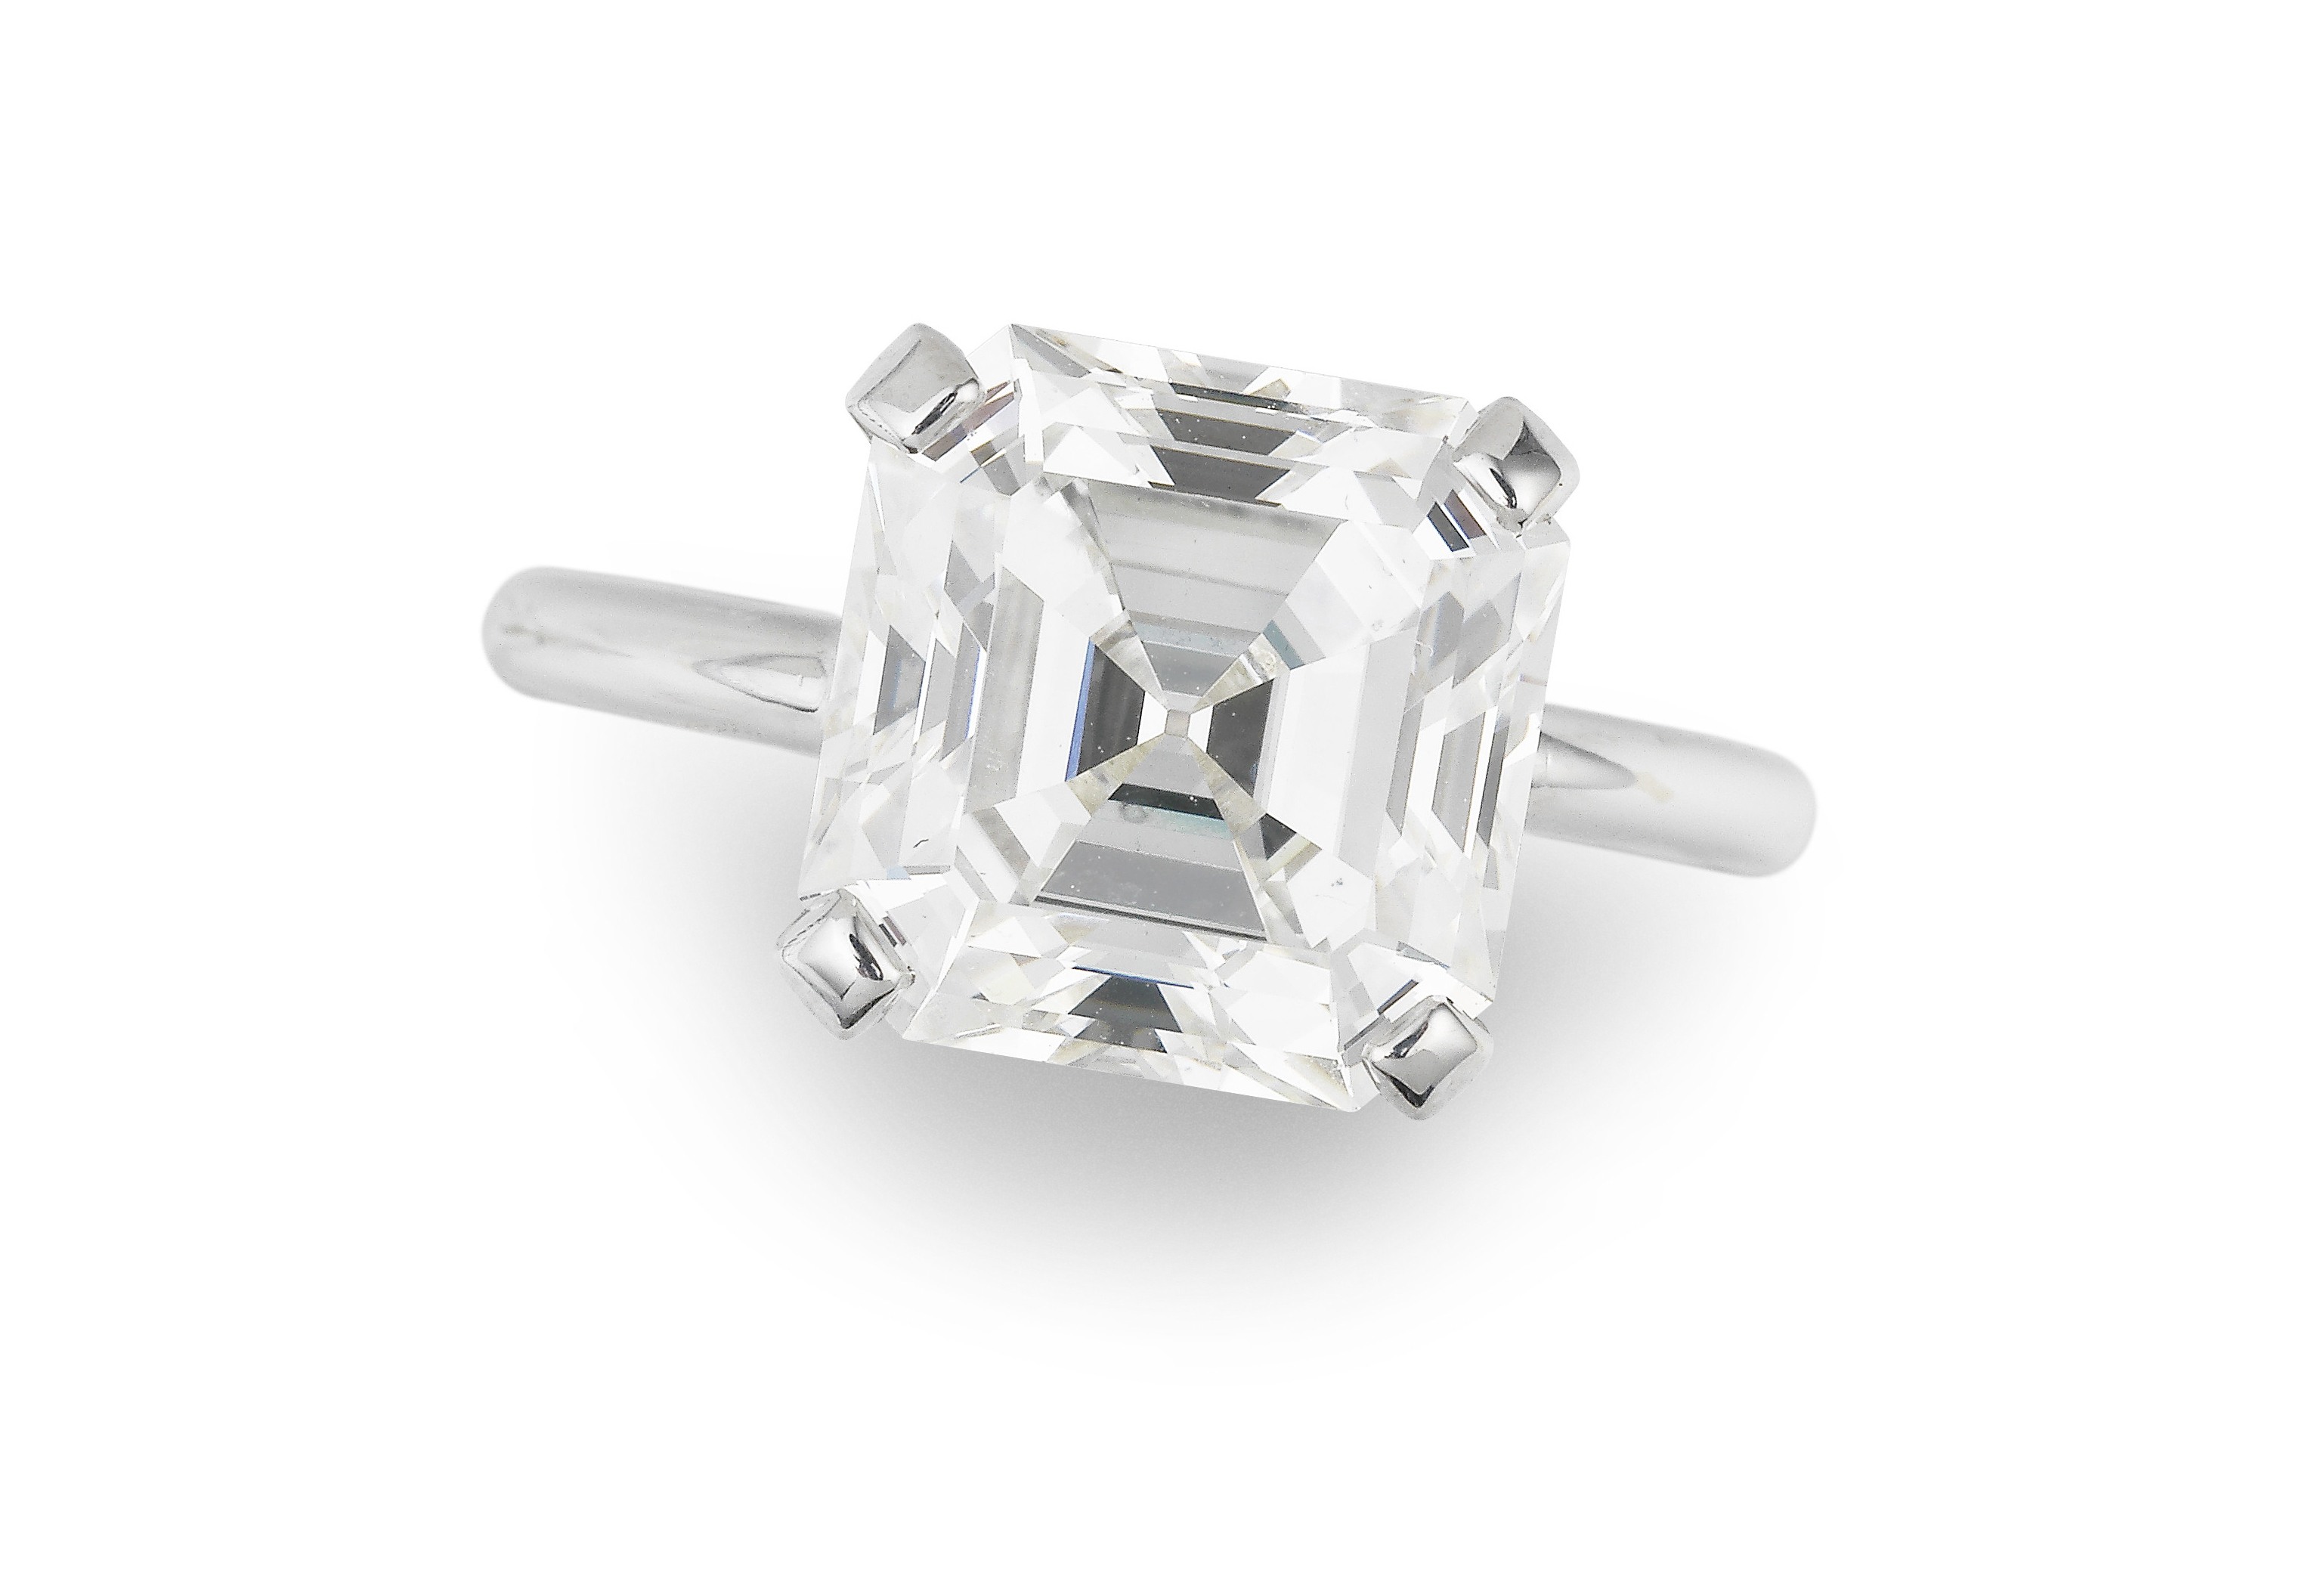 Van Cleef Arpels Single Stone Diamond Ring Sparkles At Auction